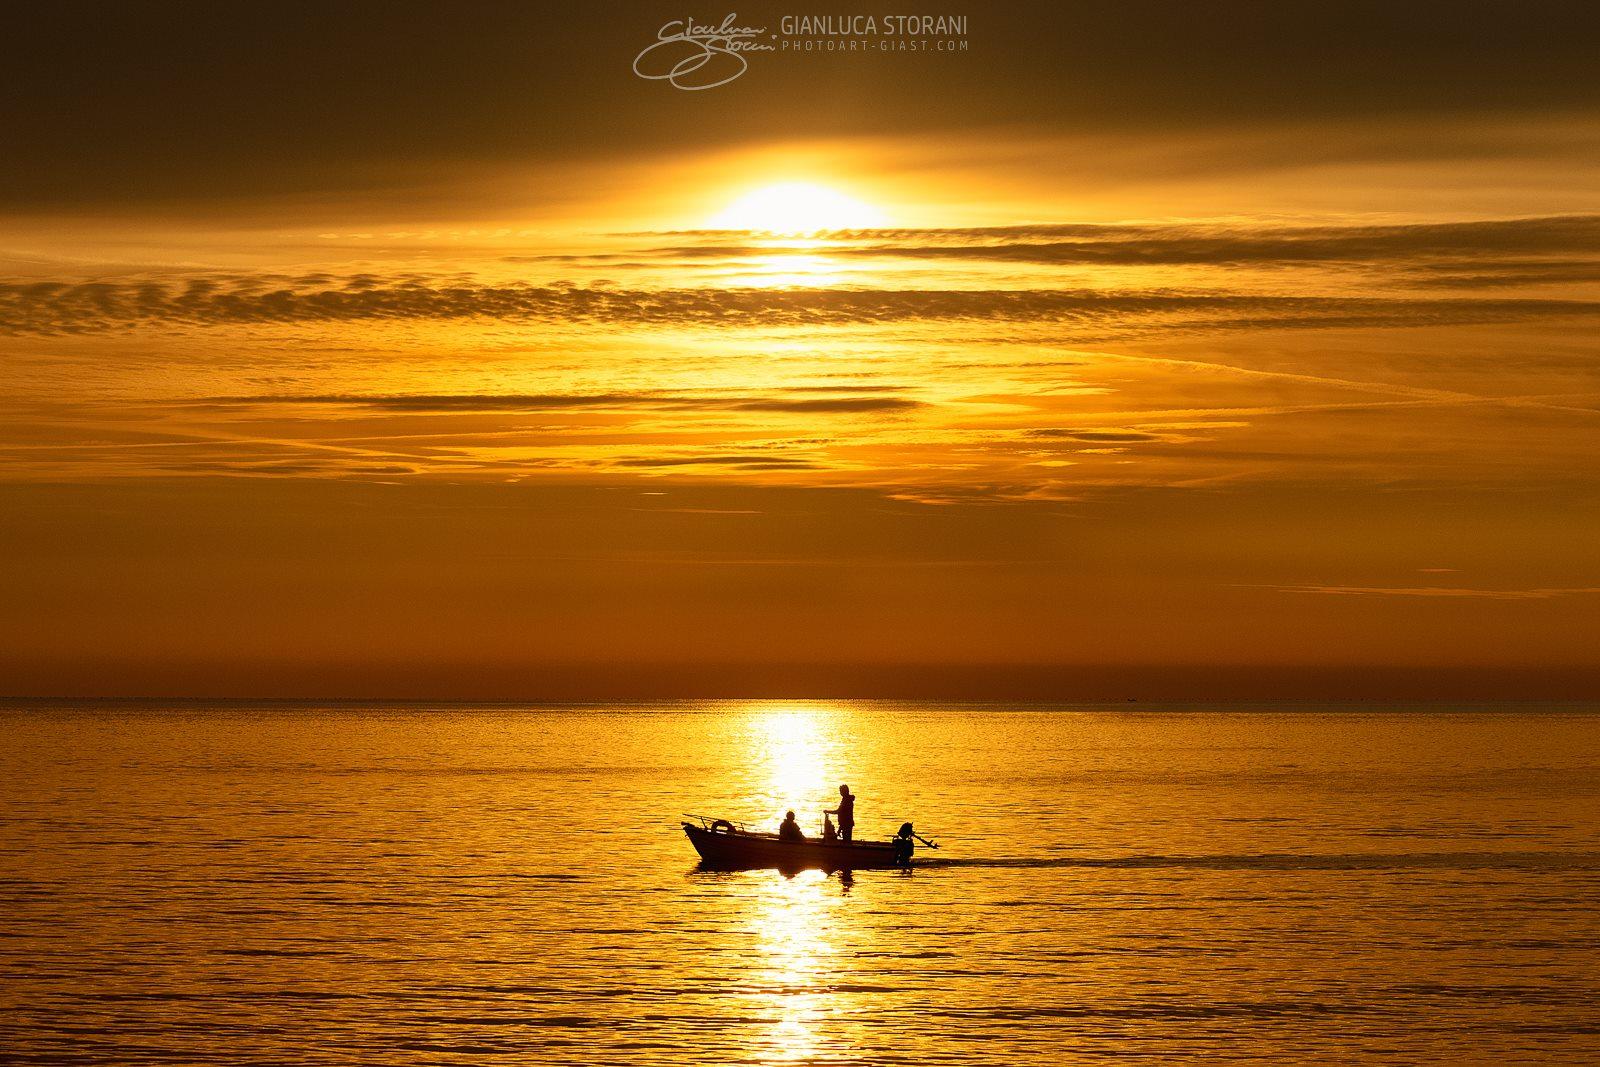 L'ora d'oro - Gianluca Storani Photo Art (ID: 3-0713)